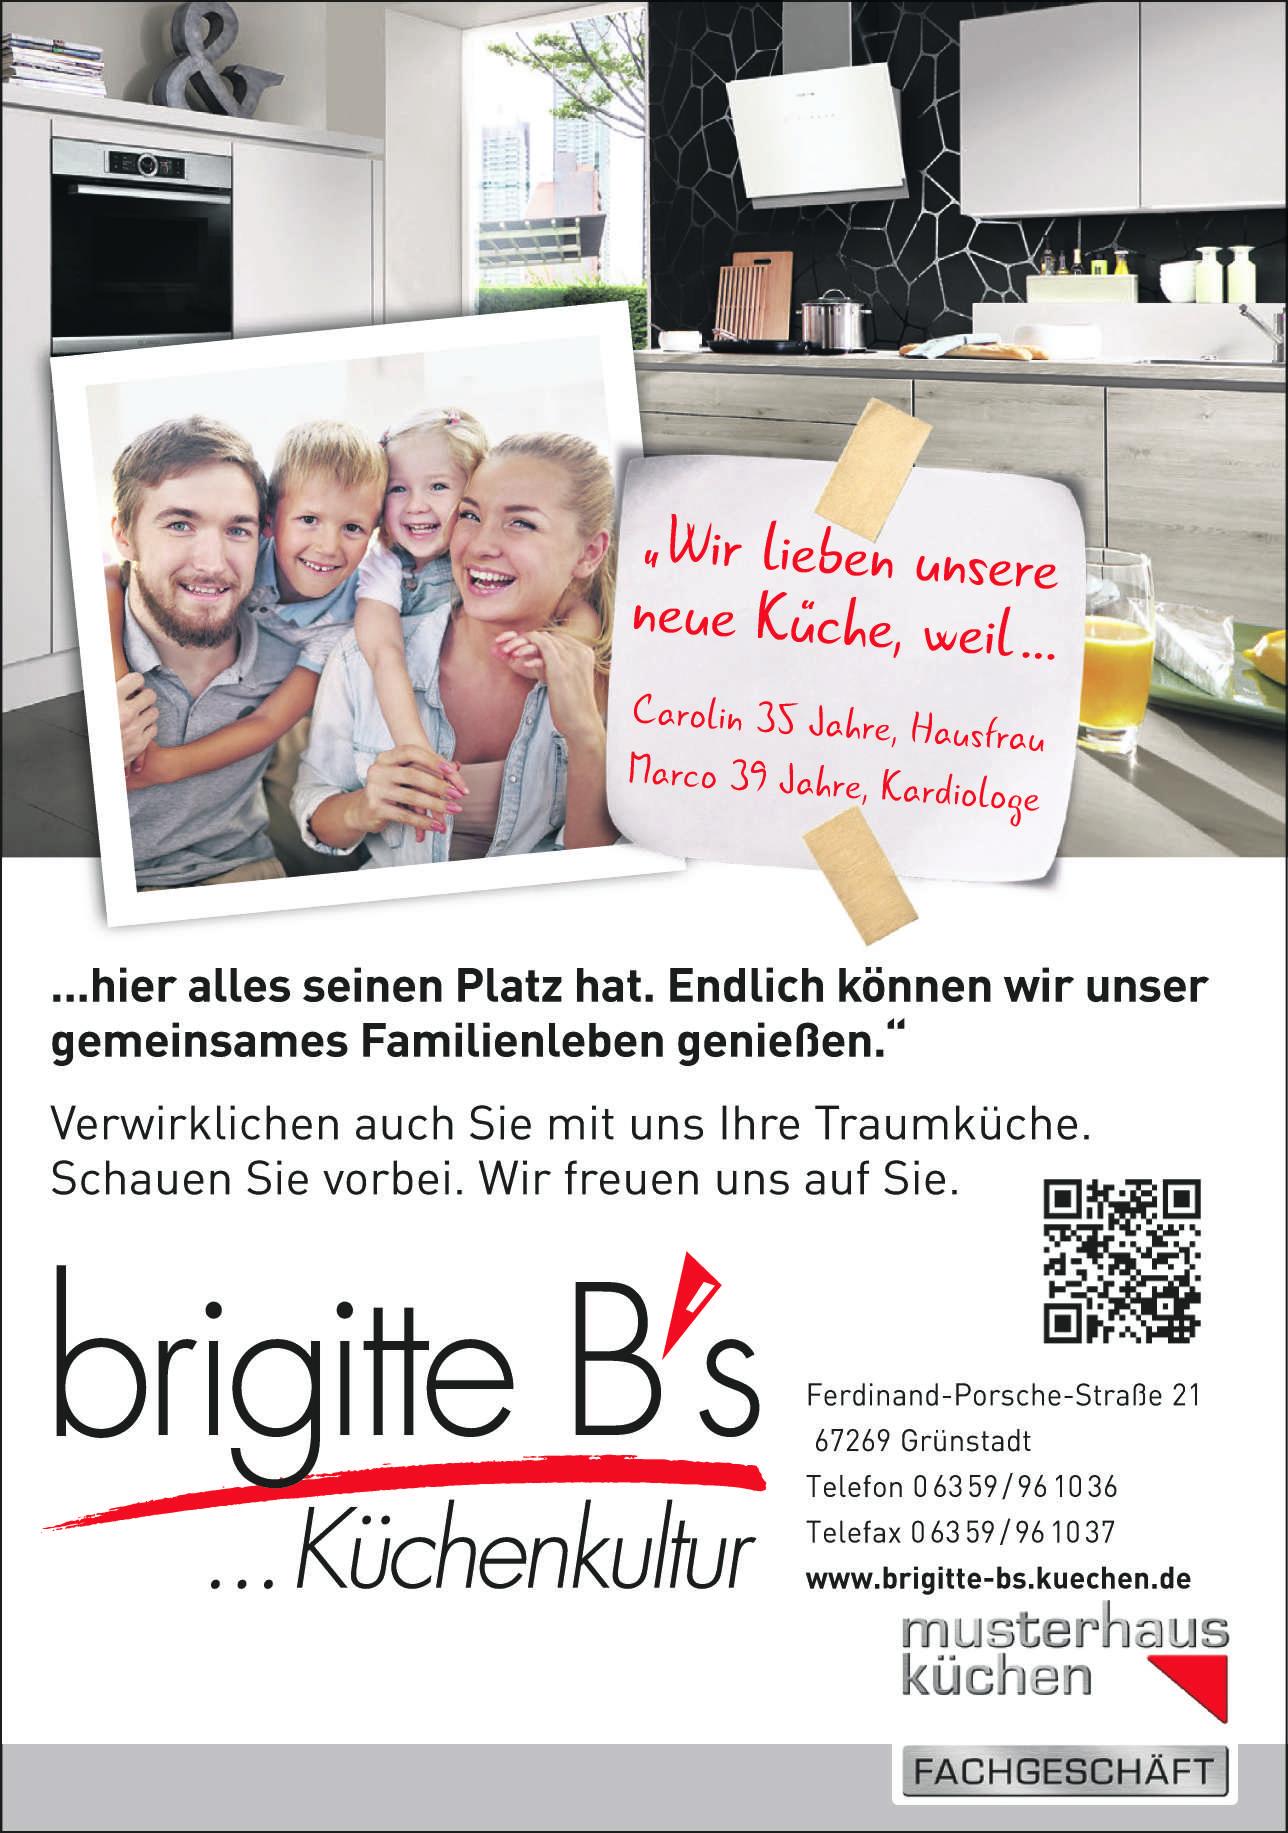 brigitte b's